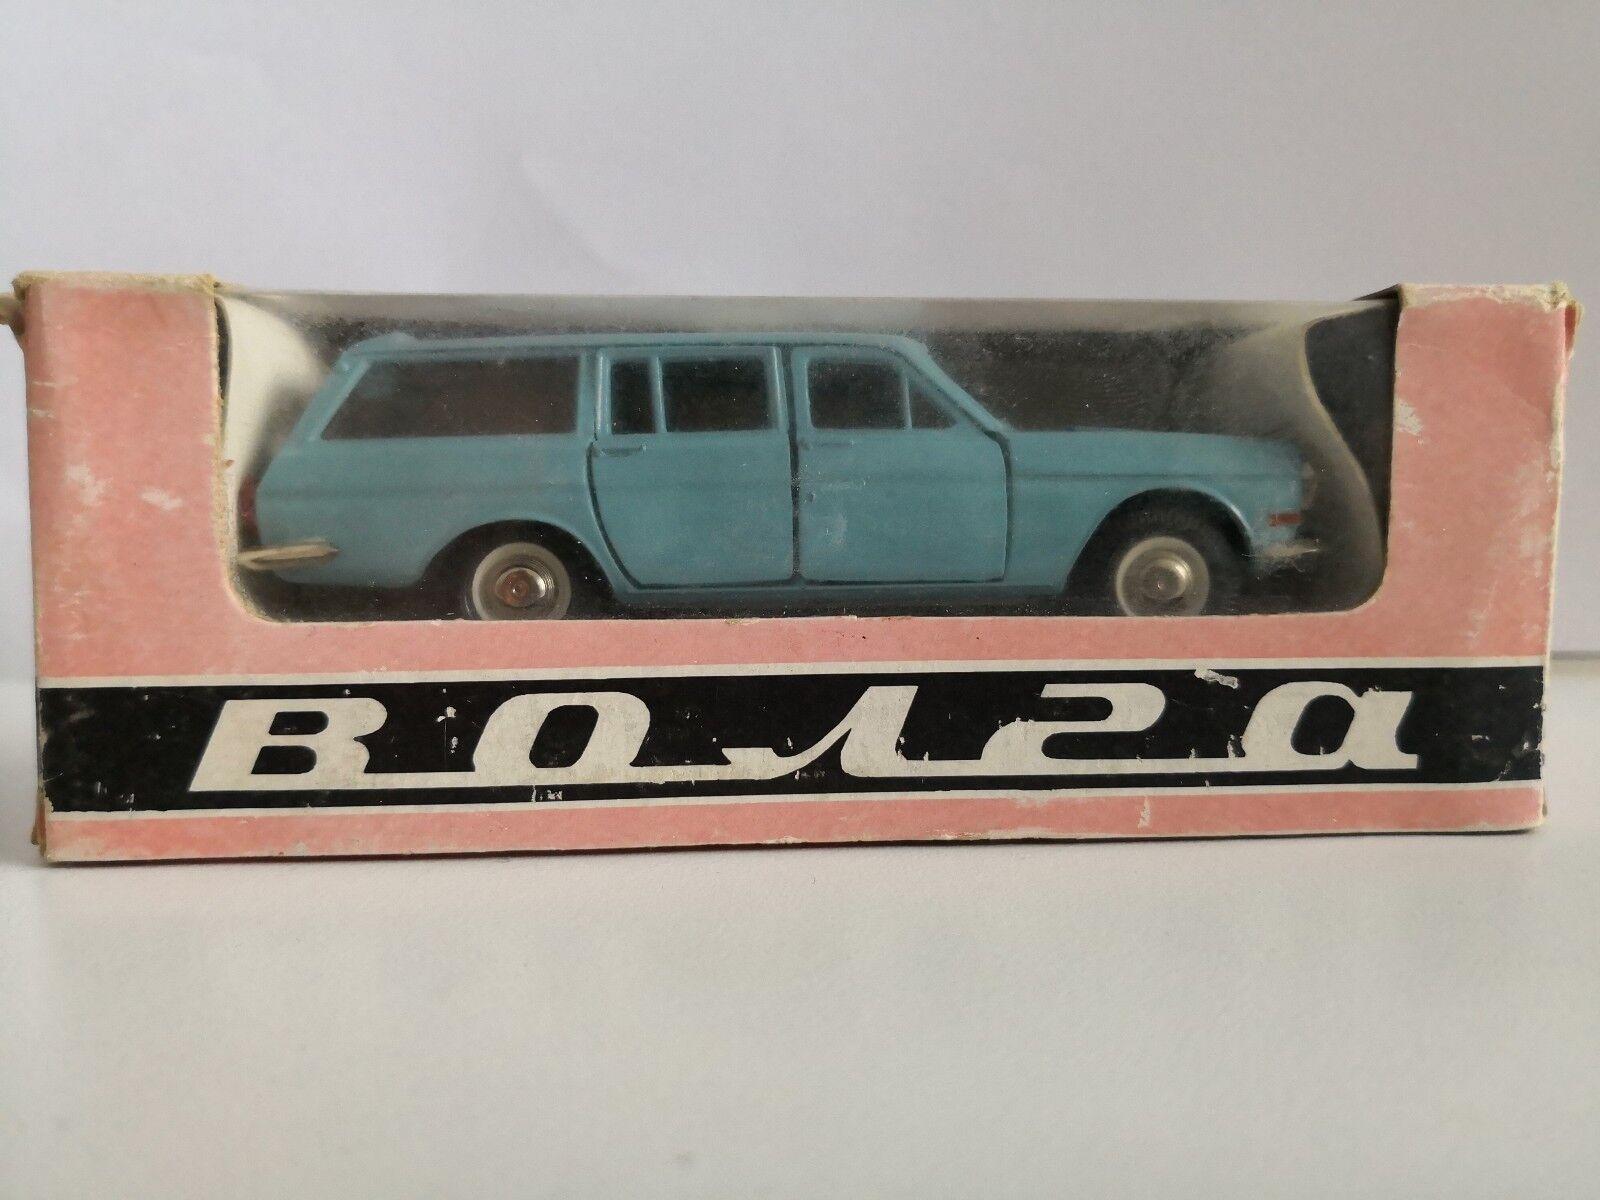 USSR Saratov 1 43 - GAZ 24 02 Volga Car bluee.Soviet.Mint in box .